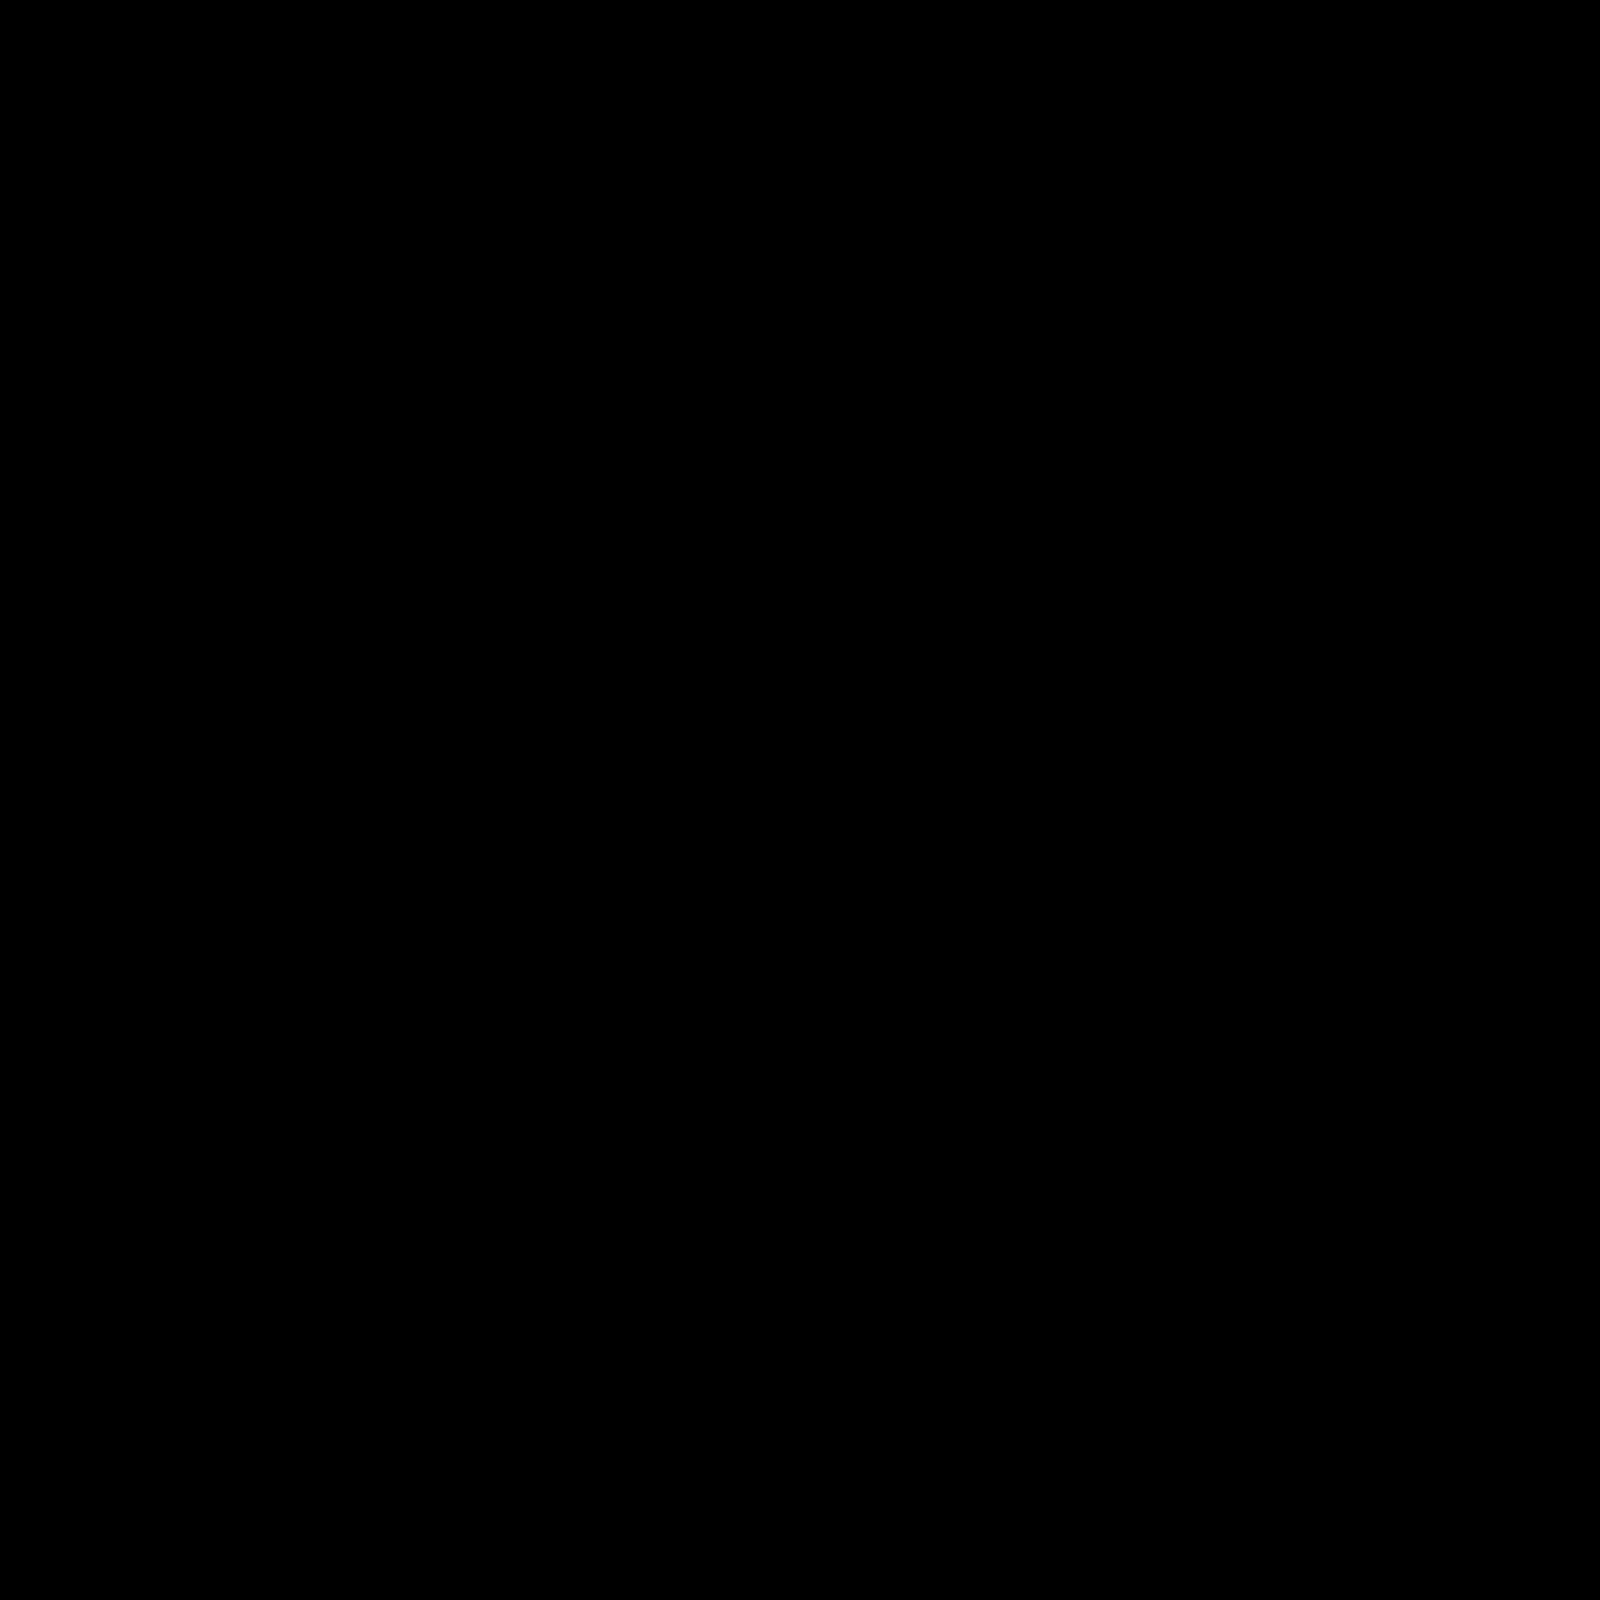 Kartka papieru icon